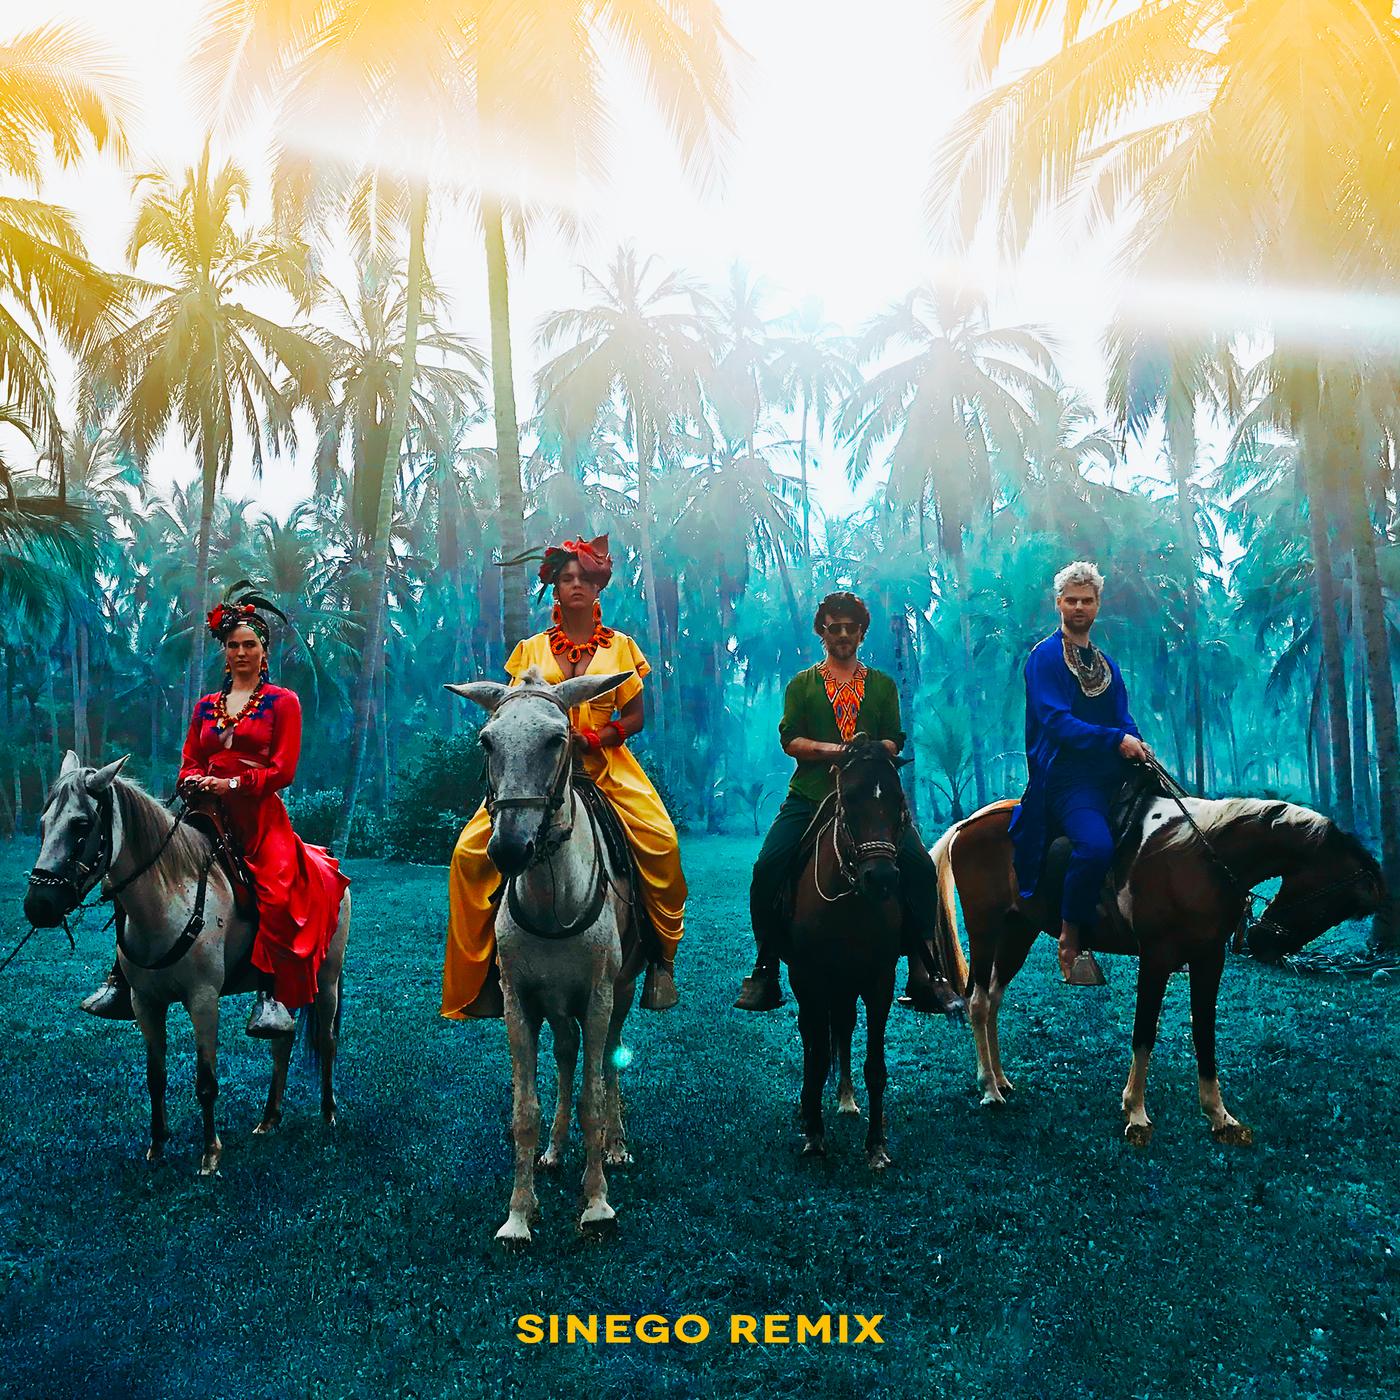 Playa Grande (Sinego Remix) - Sofi Tukker